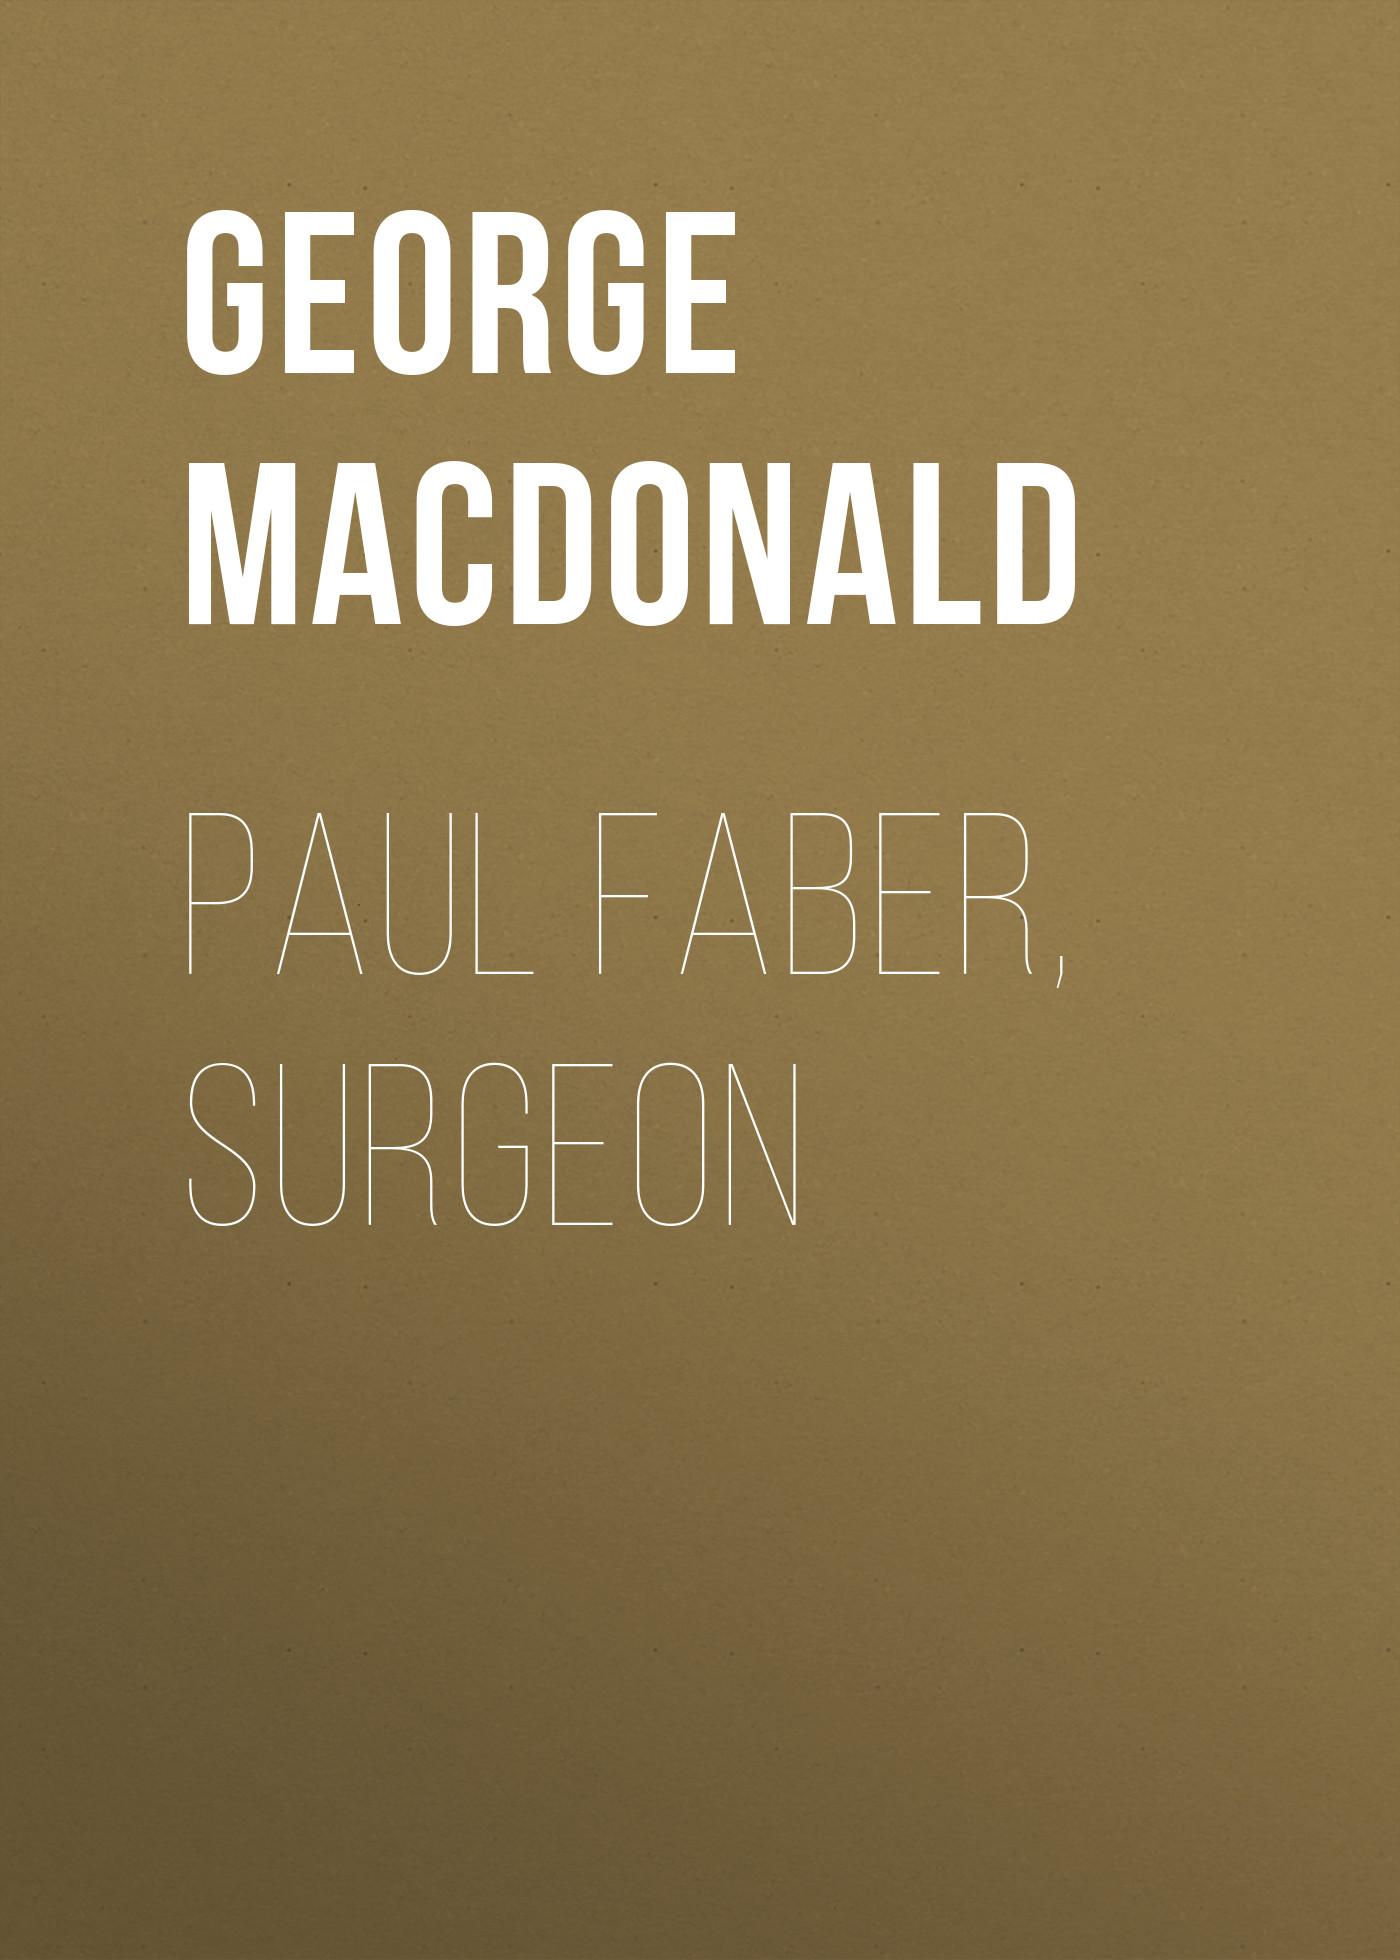 George MacDonald Paul Faber, Surgeon george macdonald paul faber surgeon